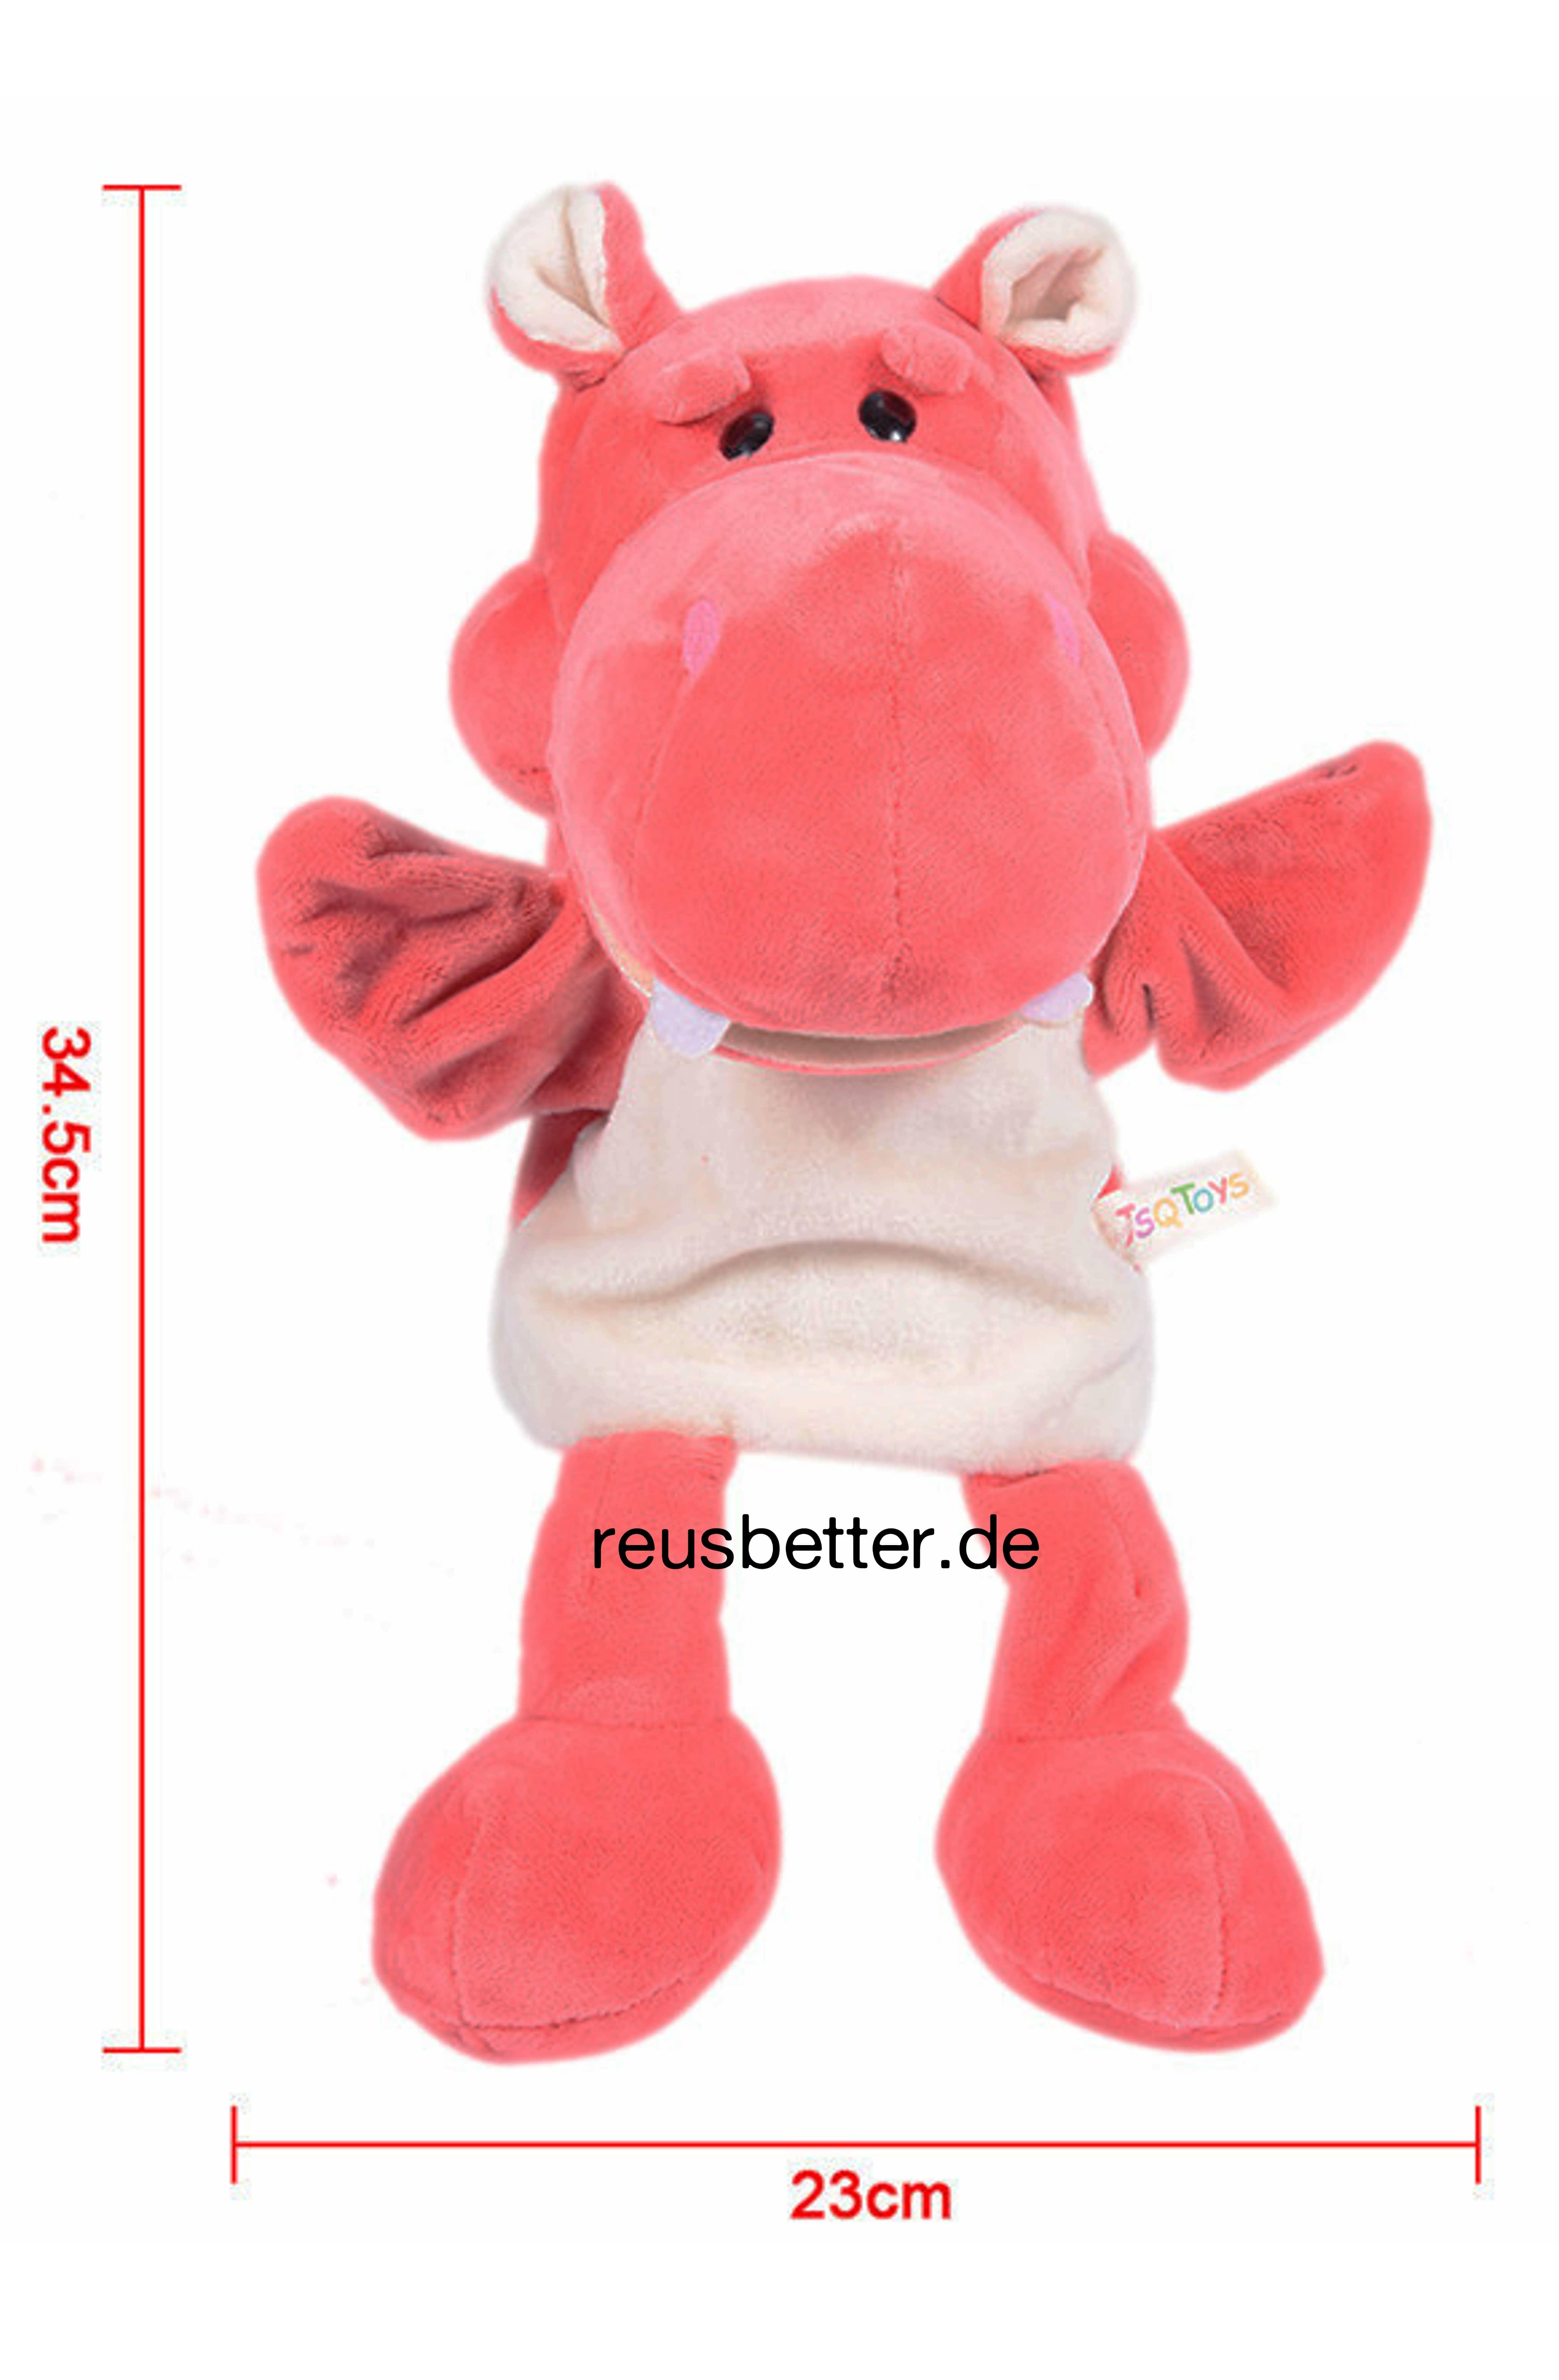 Second Hand & Fanartikel Online Shop - Reusbetter Handspieltier ...